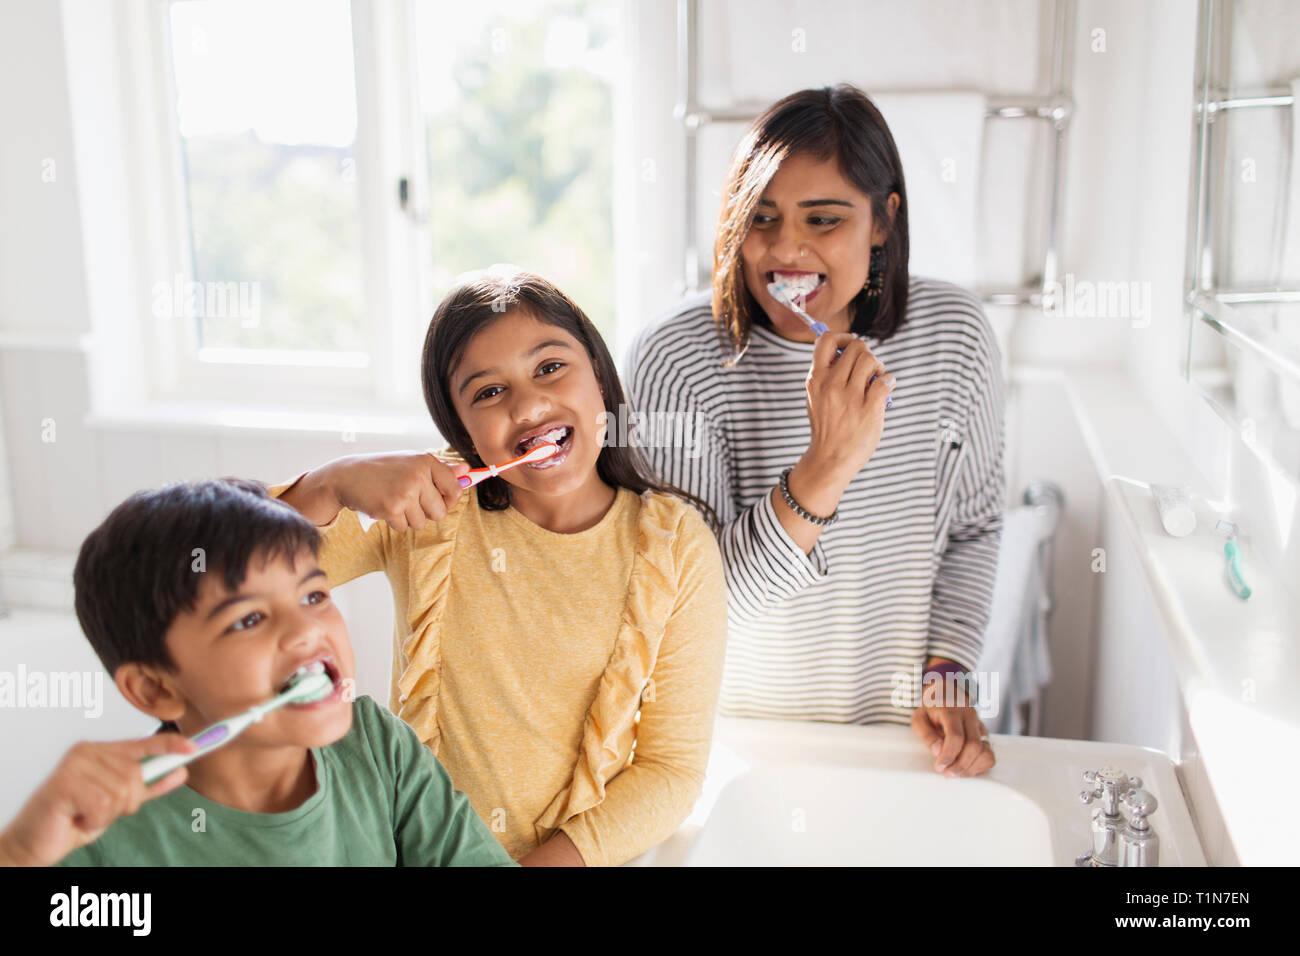 Portrait happy family brushing teeth in bathroom Stock Photo